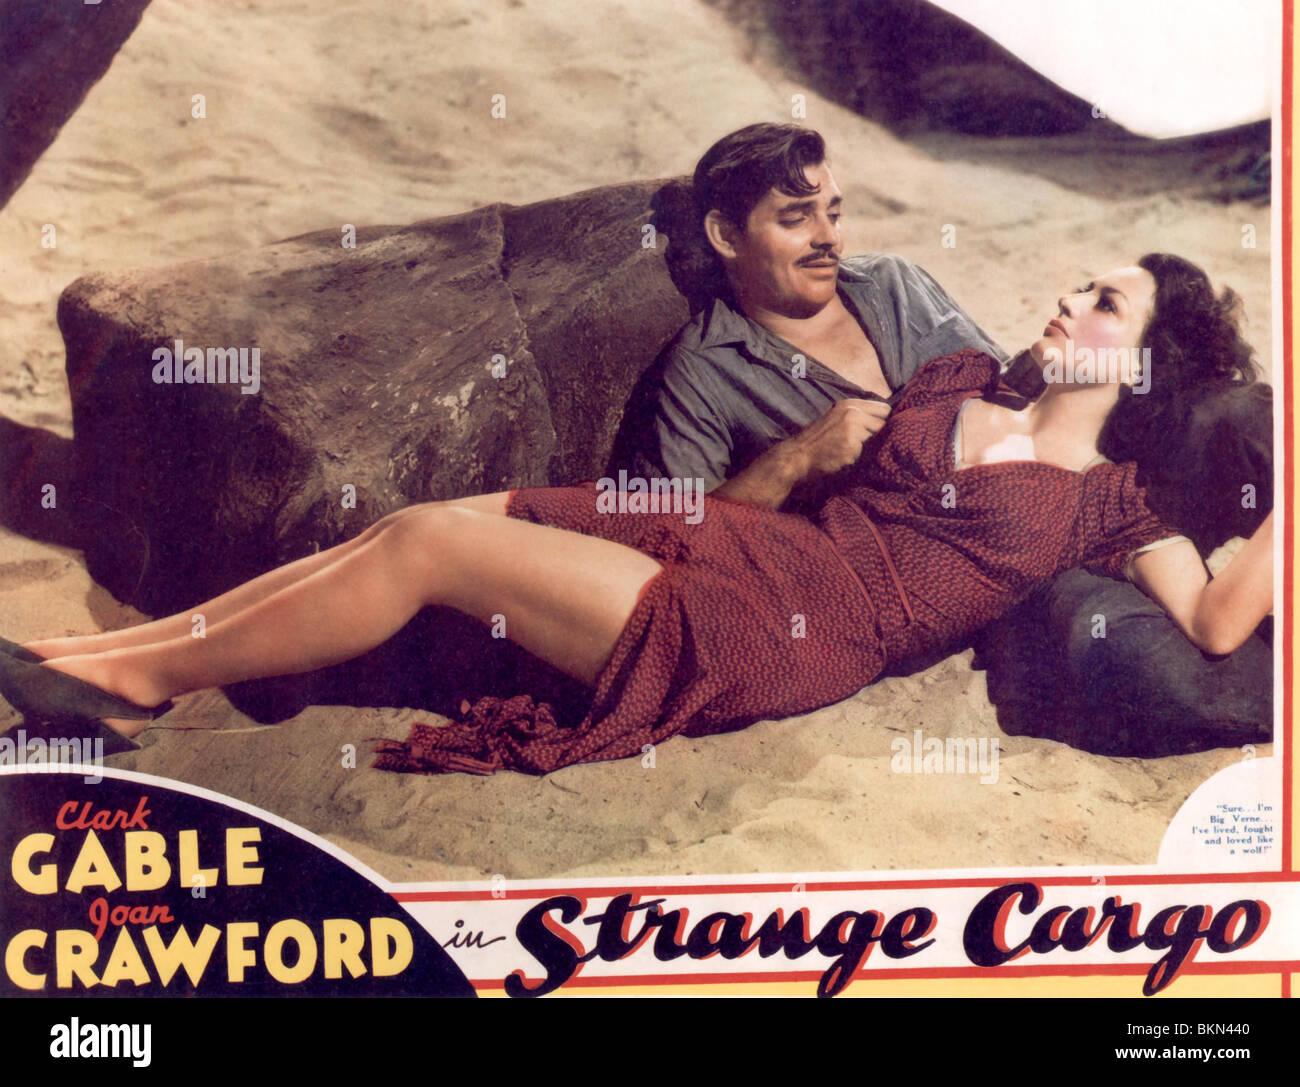 STRANGE CARGO (1940) POSTER SCGR 001POST - Stock Image